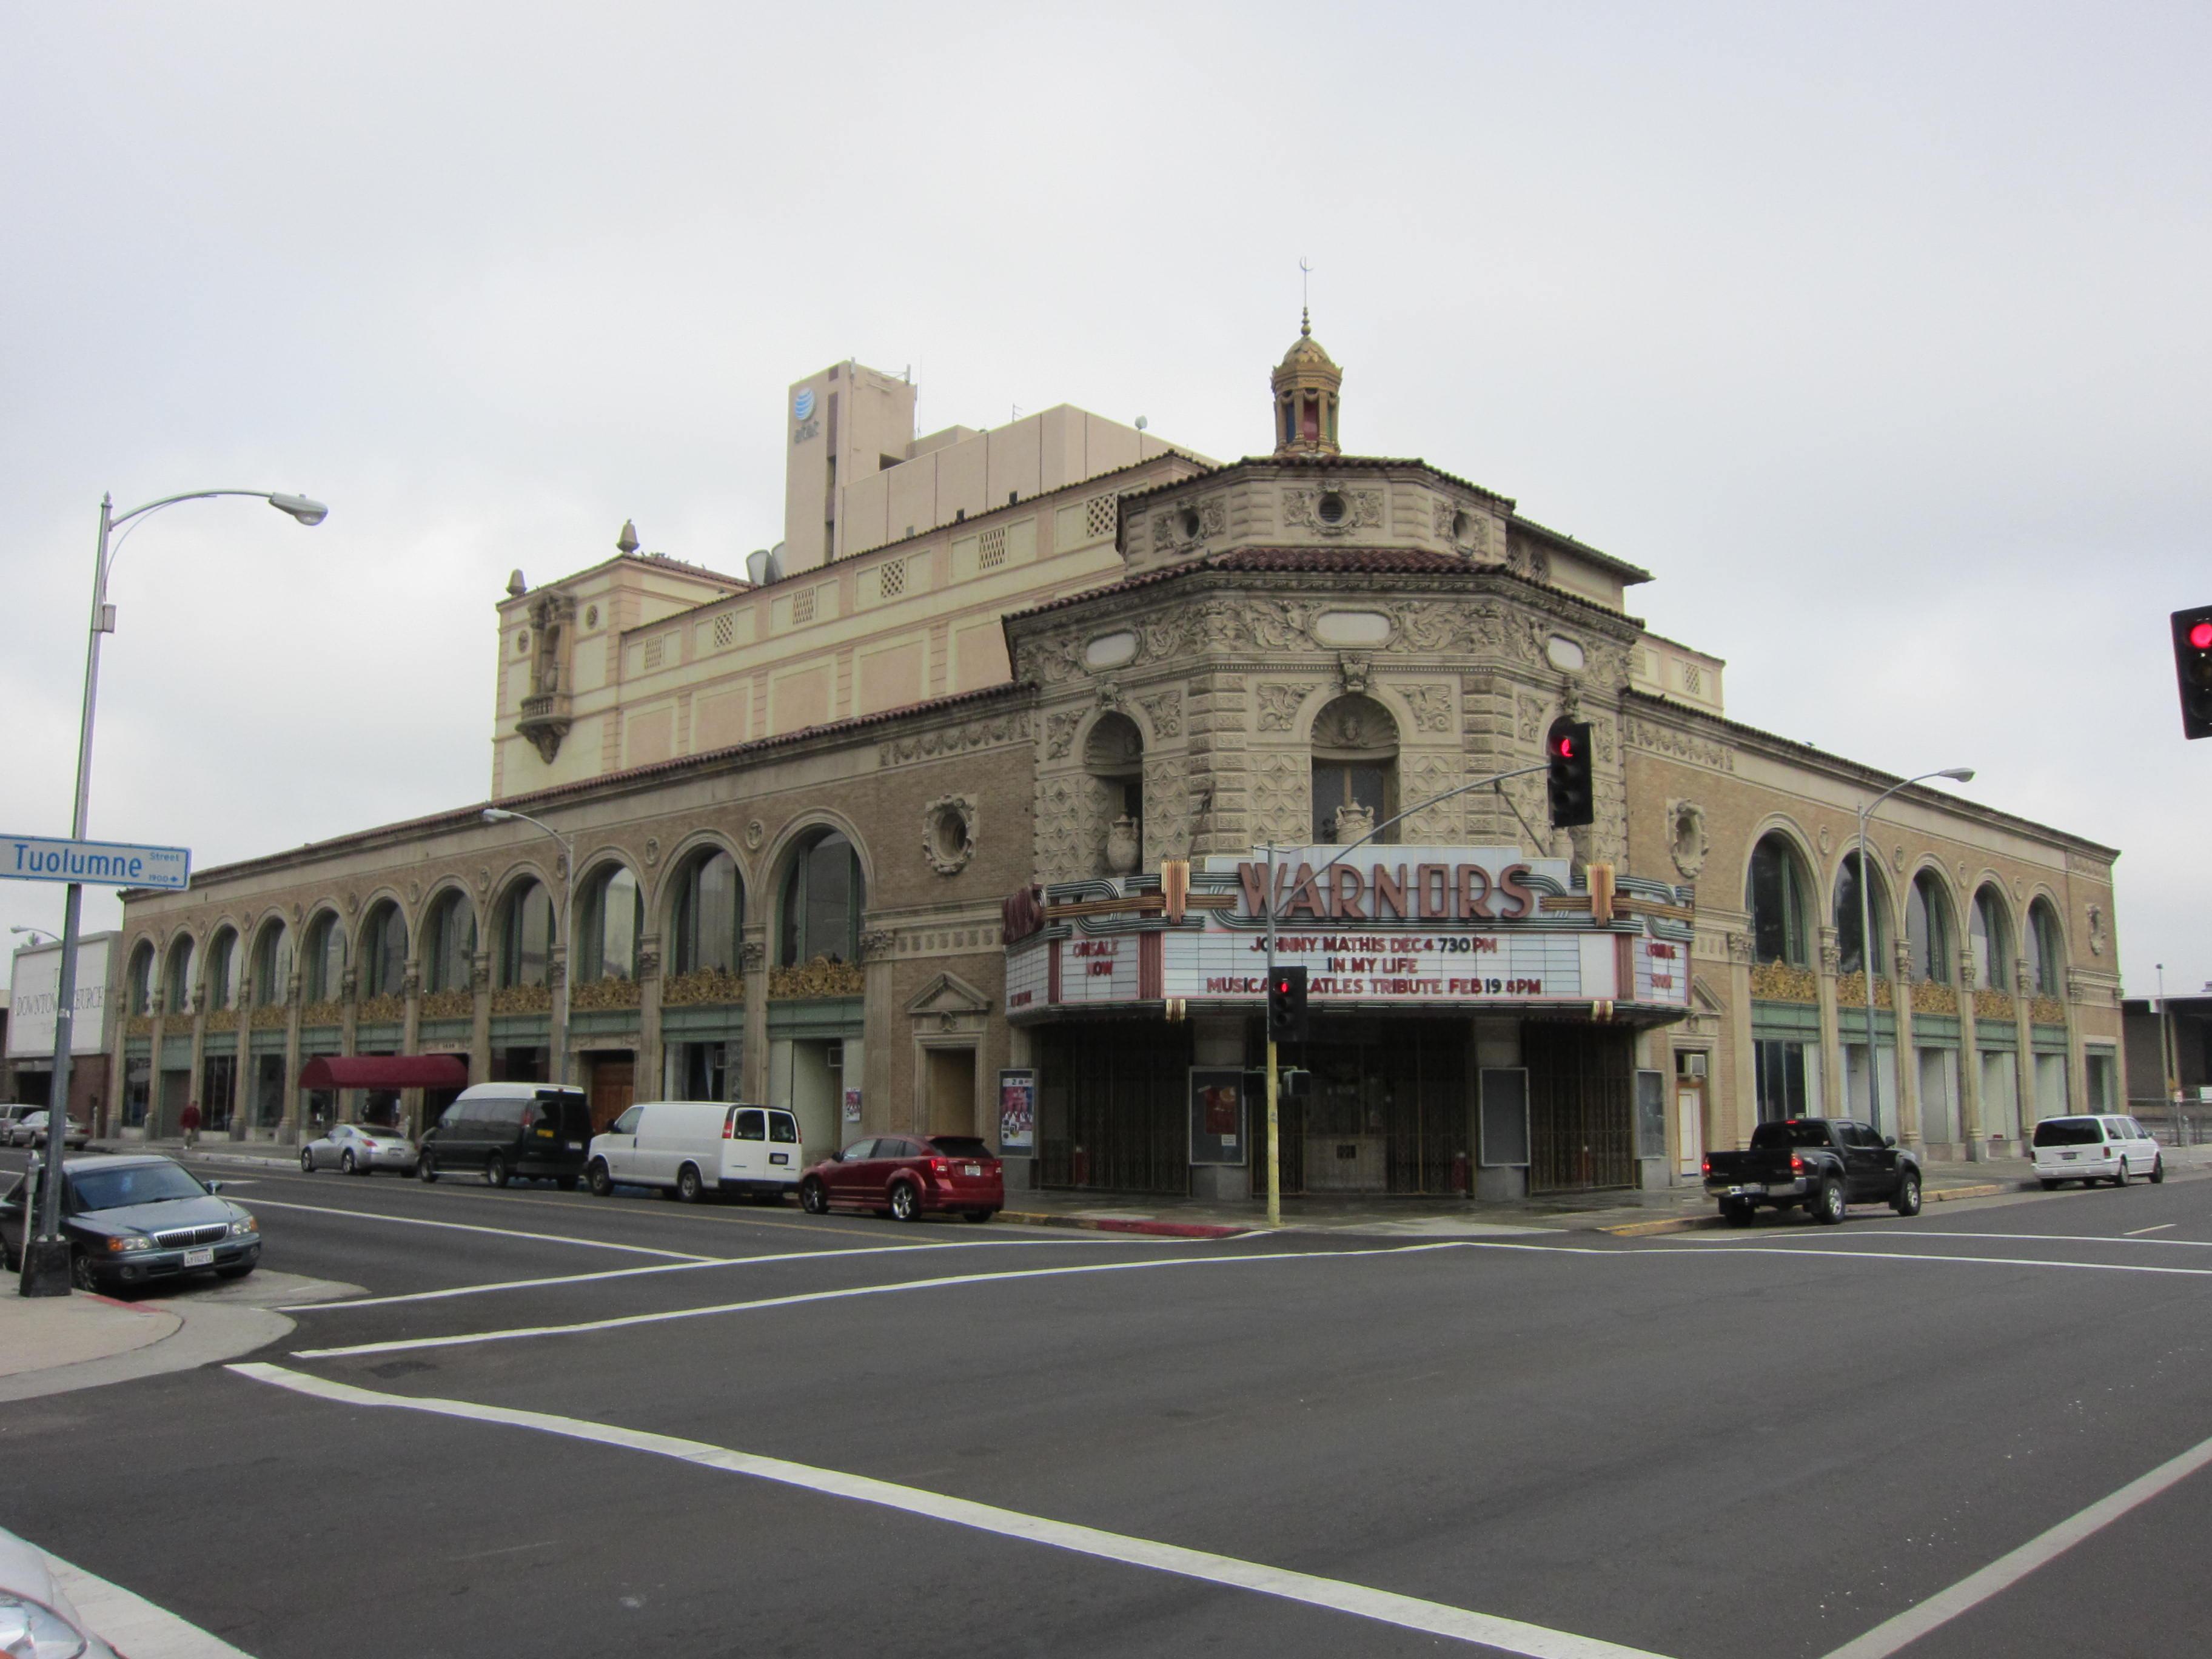 Warnors Theatre 001.jpg